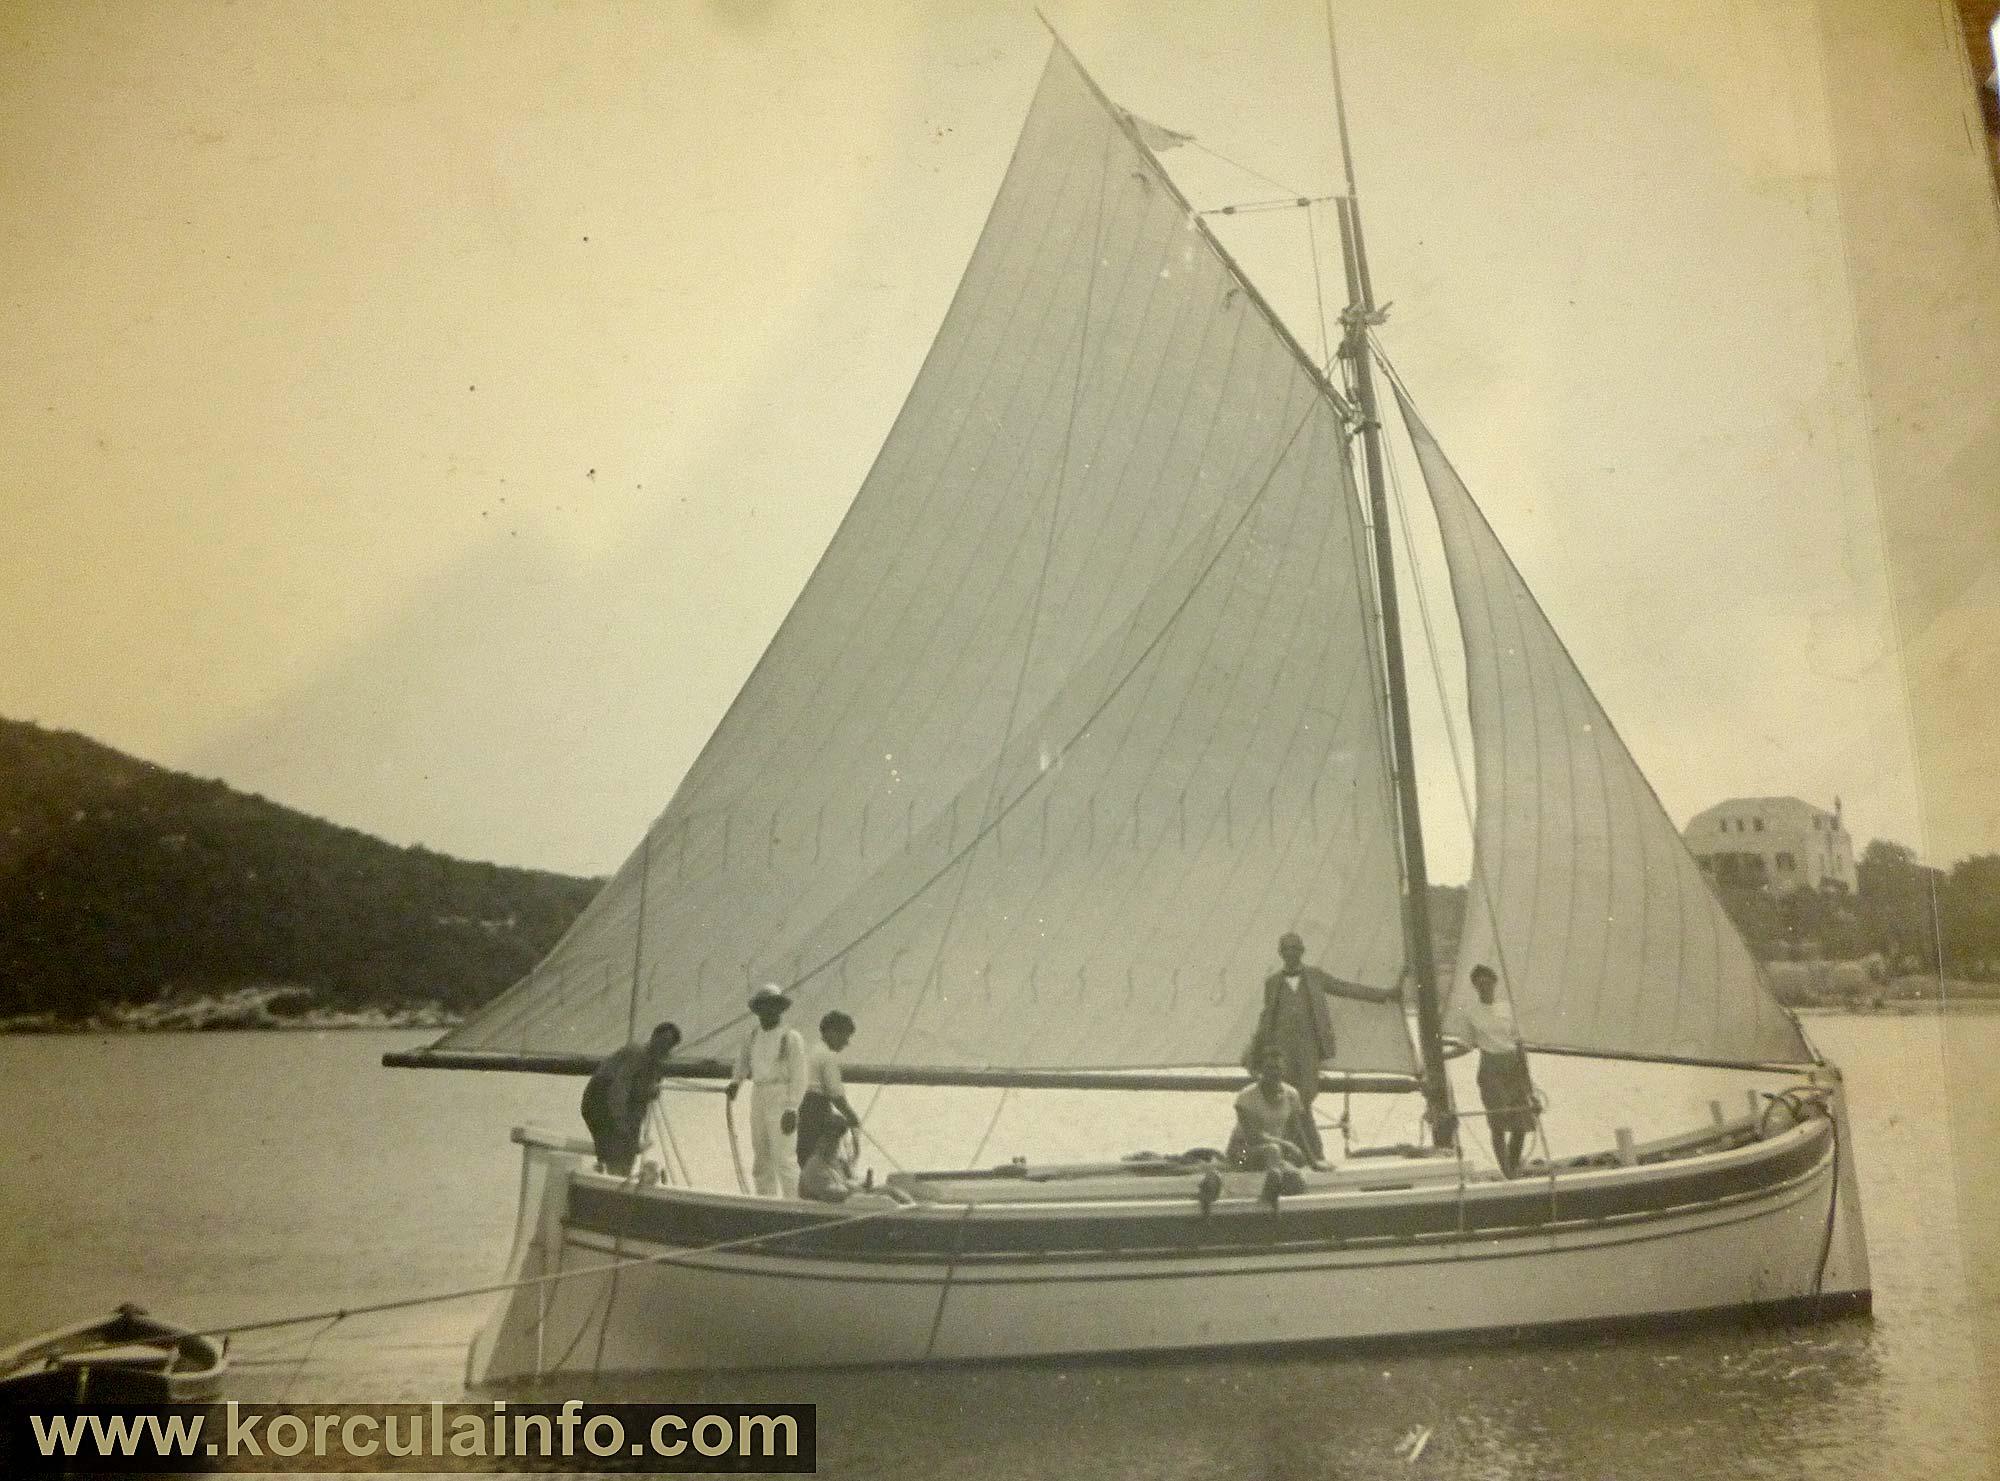 festina-lente-nasta-rojc1930s2